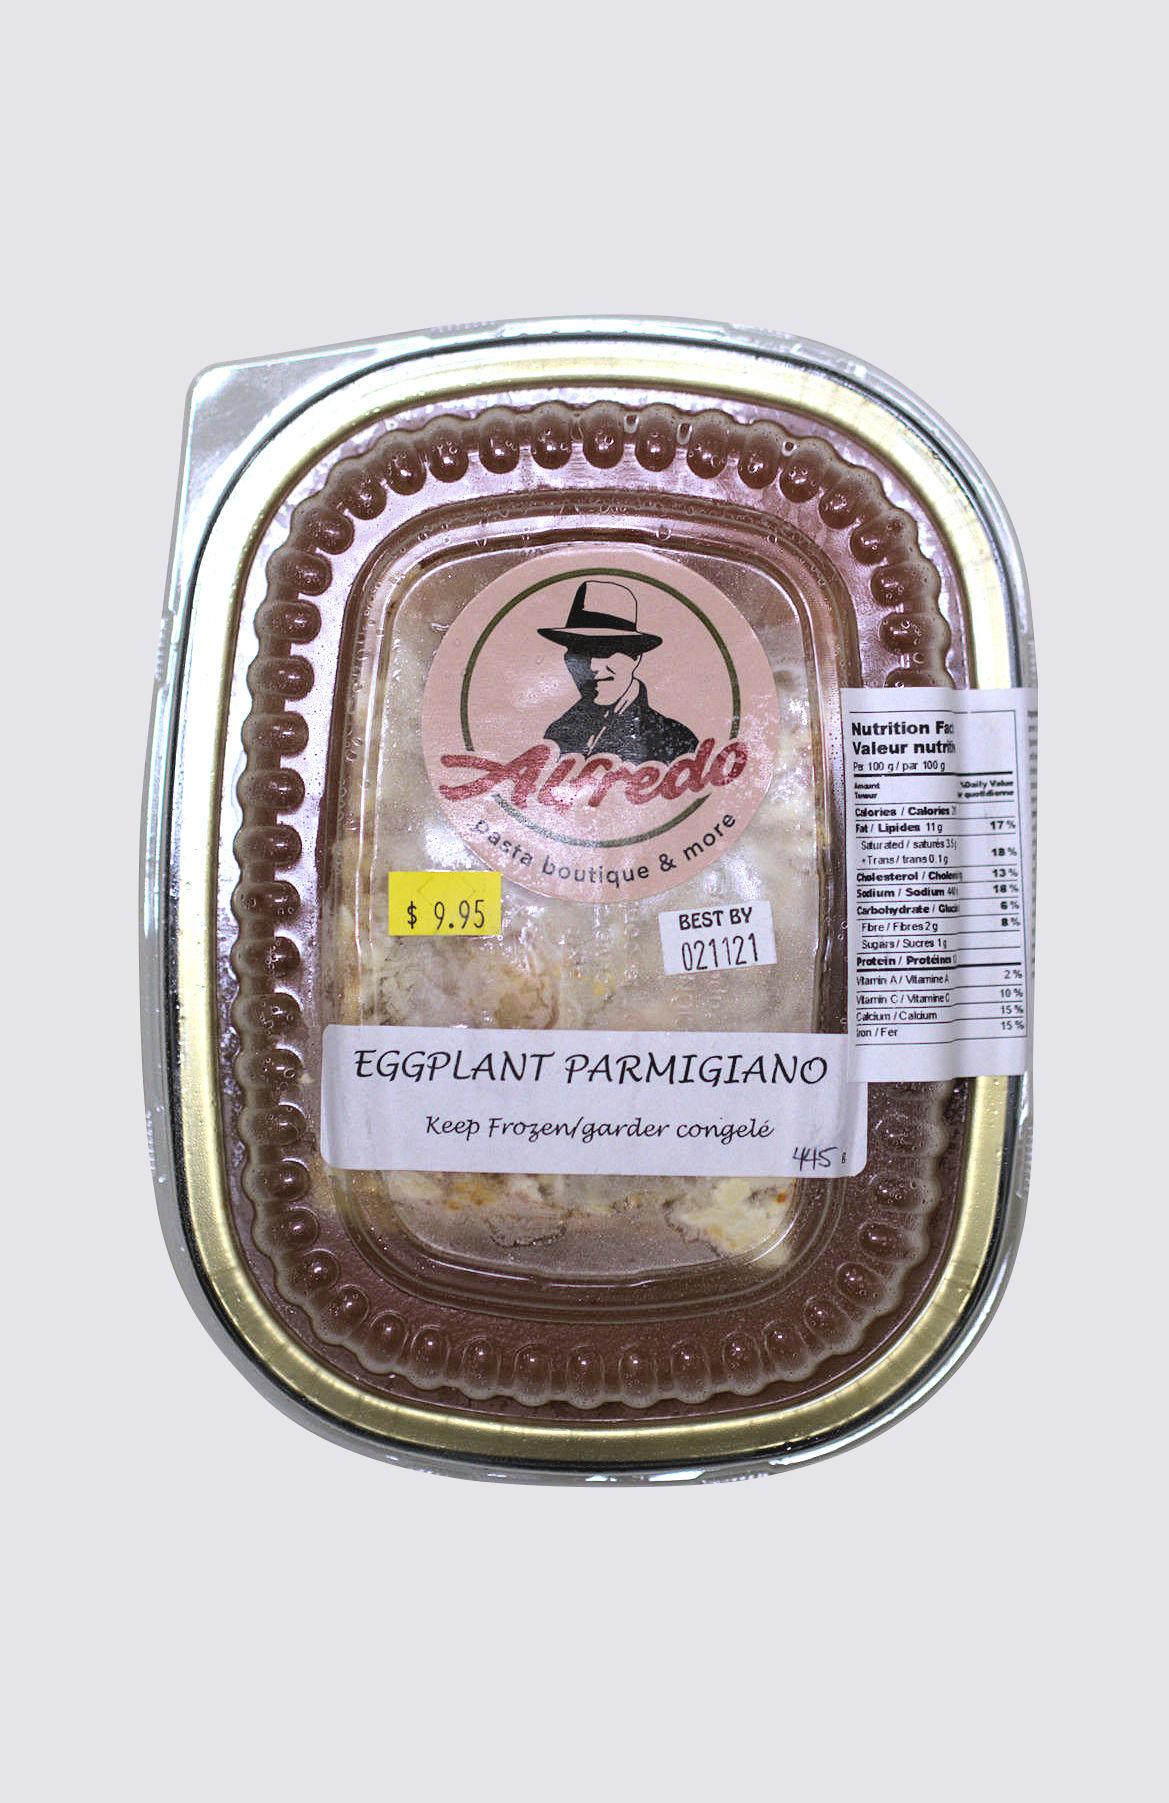 Eggplant Parmigiano - single